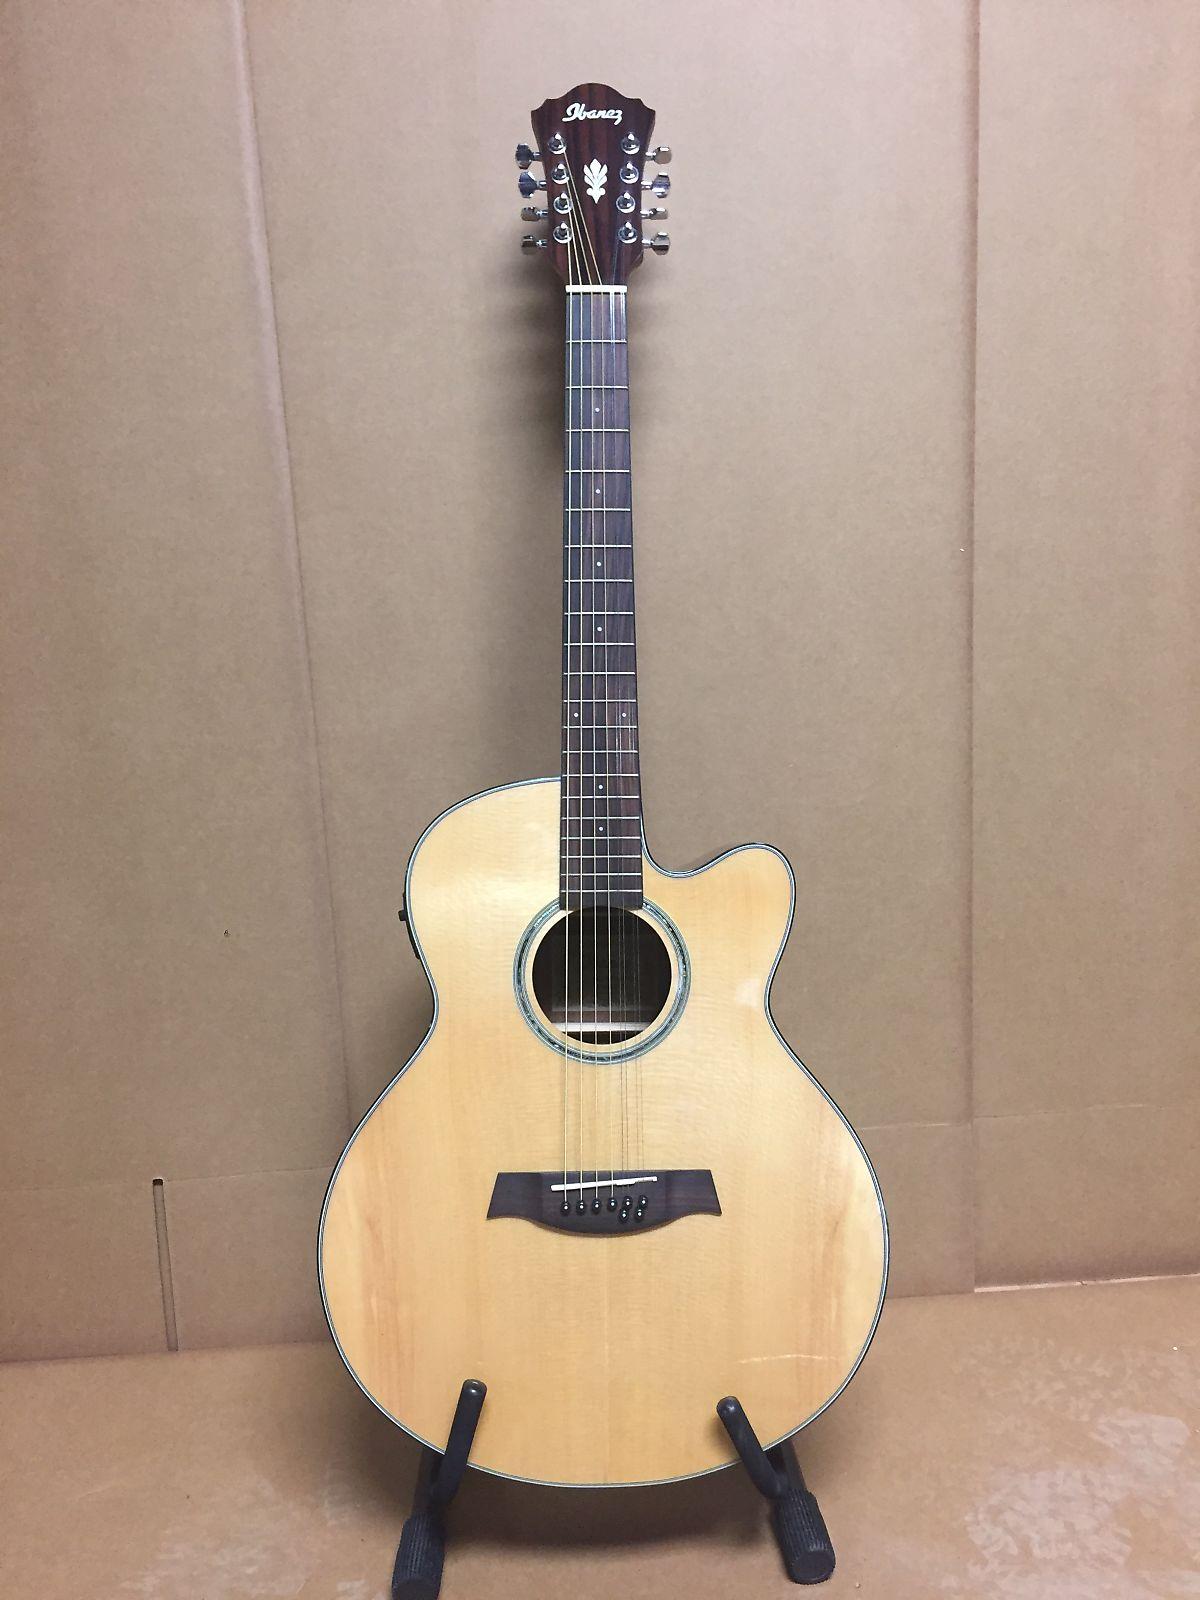 ibanez ael108tdnt 8 string acoustic electric guitar natural reverb. Black Bedroom Furniture Sets. Home Design Ideas